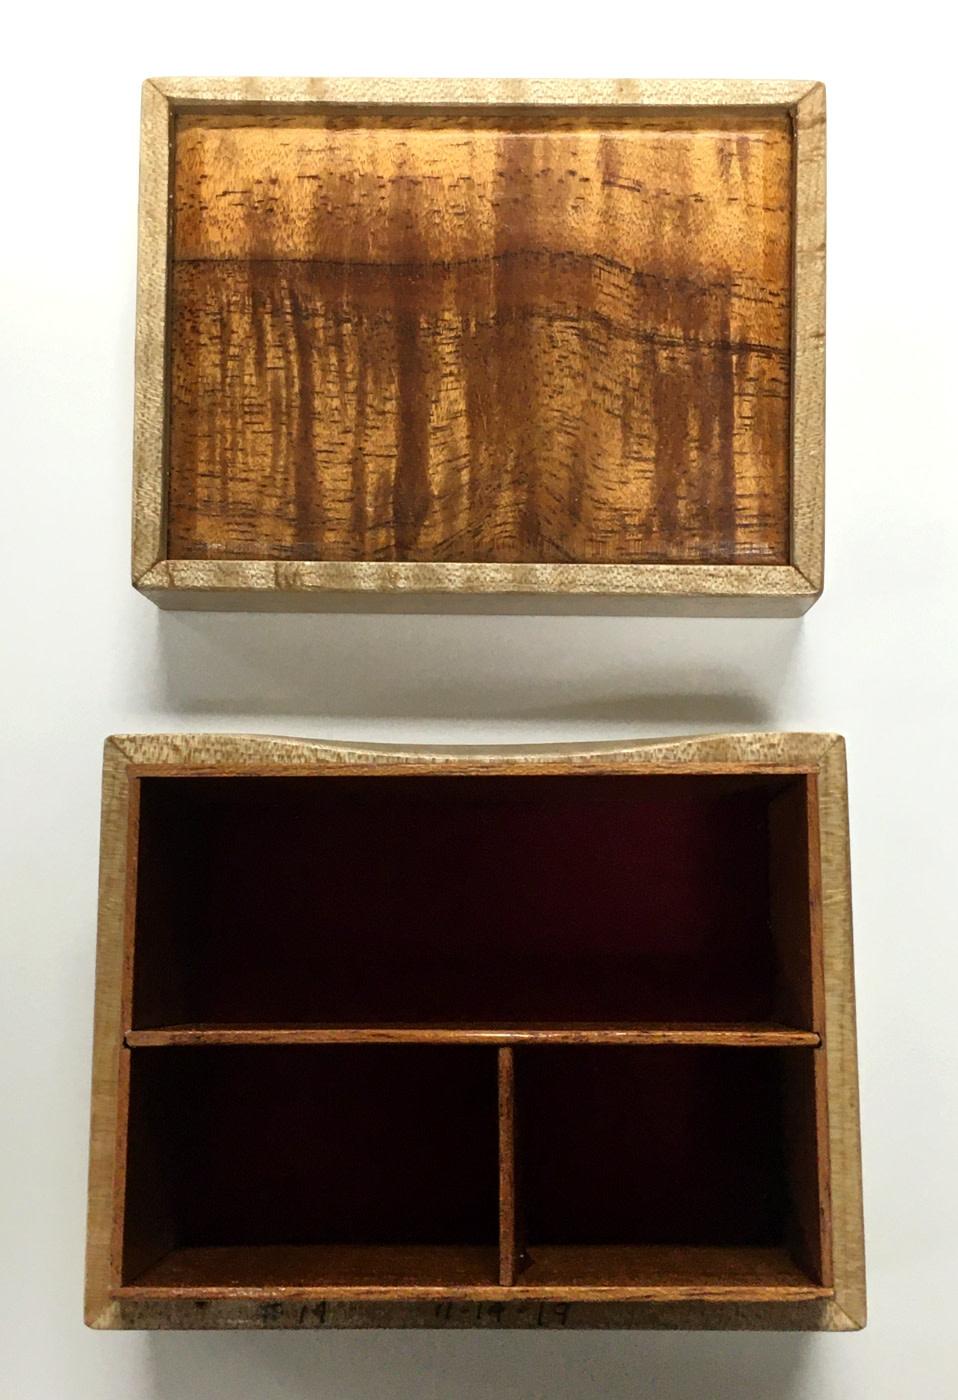 Dutch Box - Sandy's Model #14 - Koa & Maple